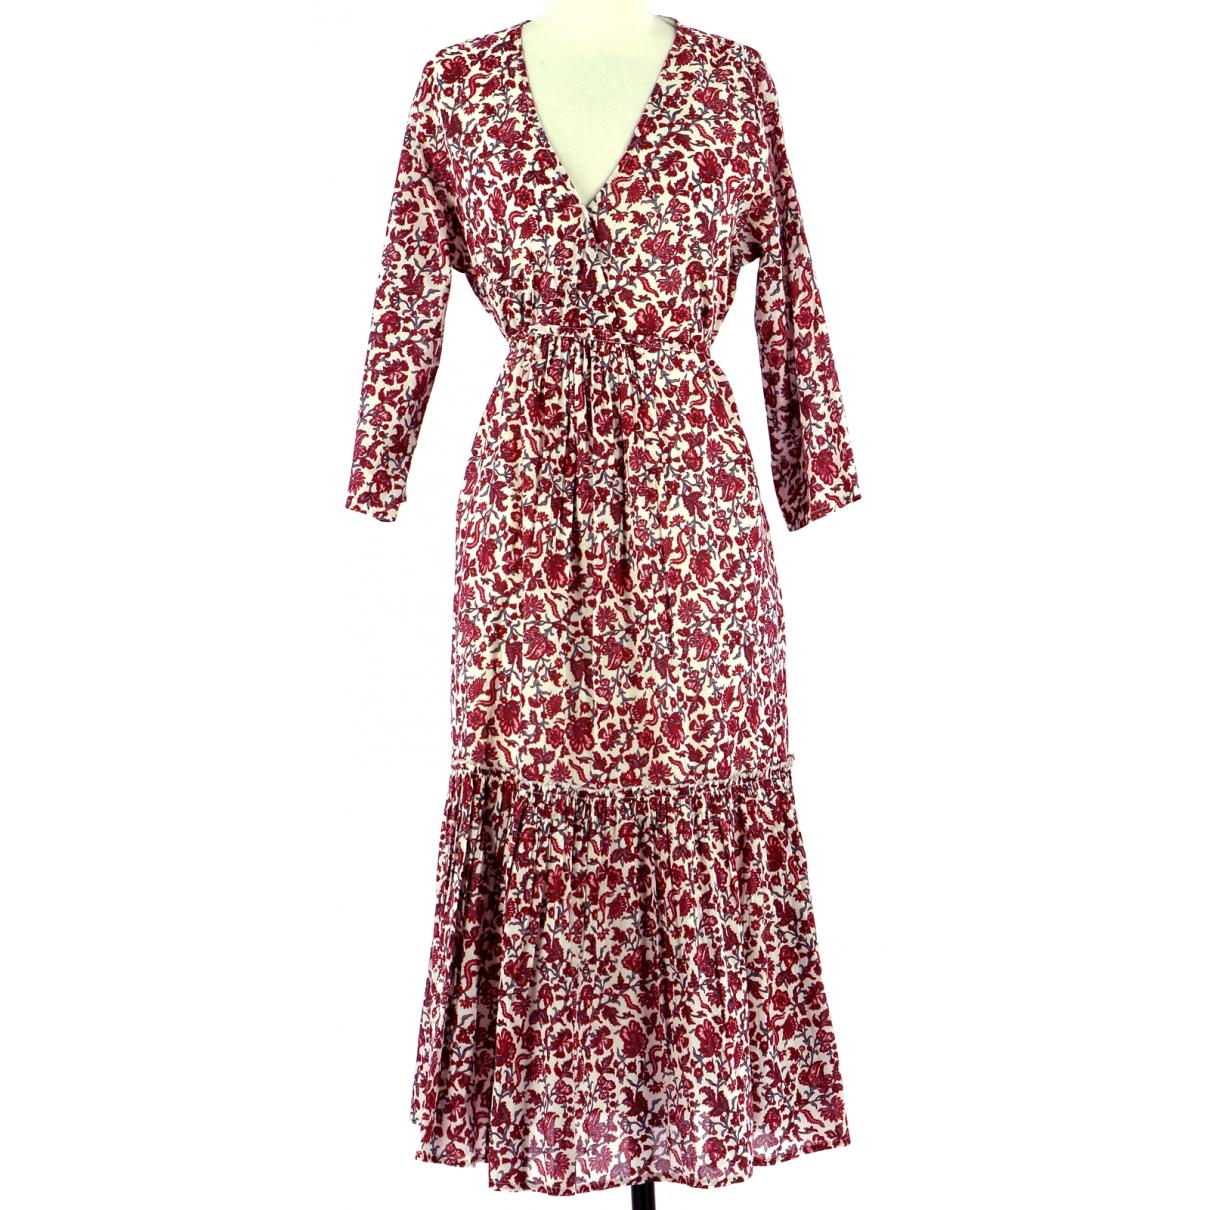 Petite Mendigote N Red Cotton dress for Women 40 FR